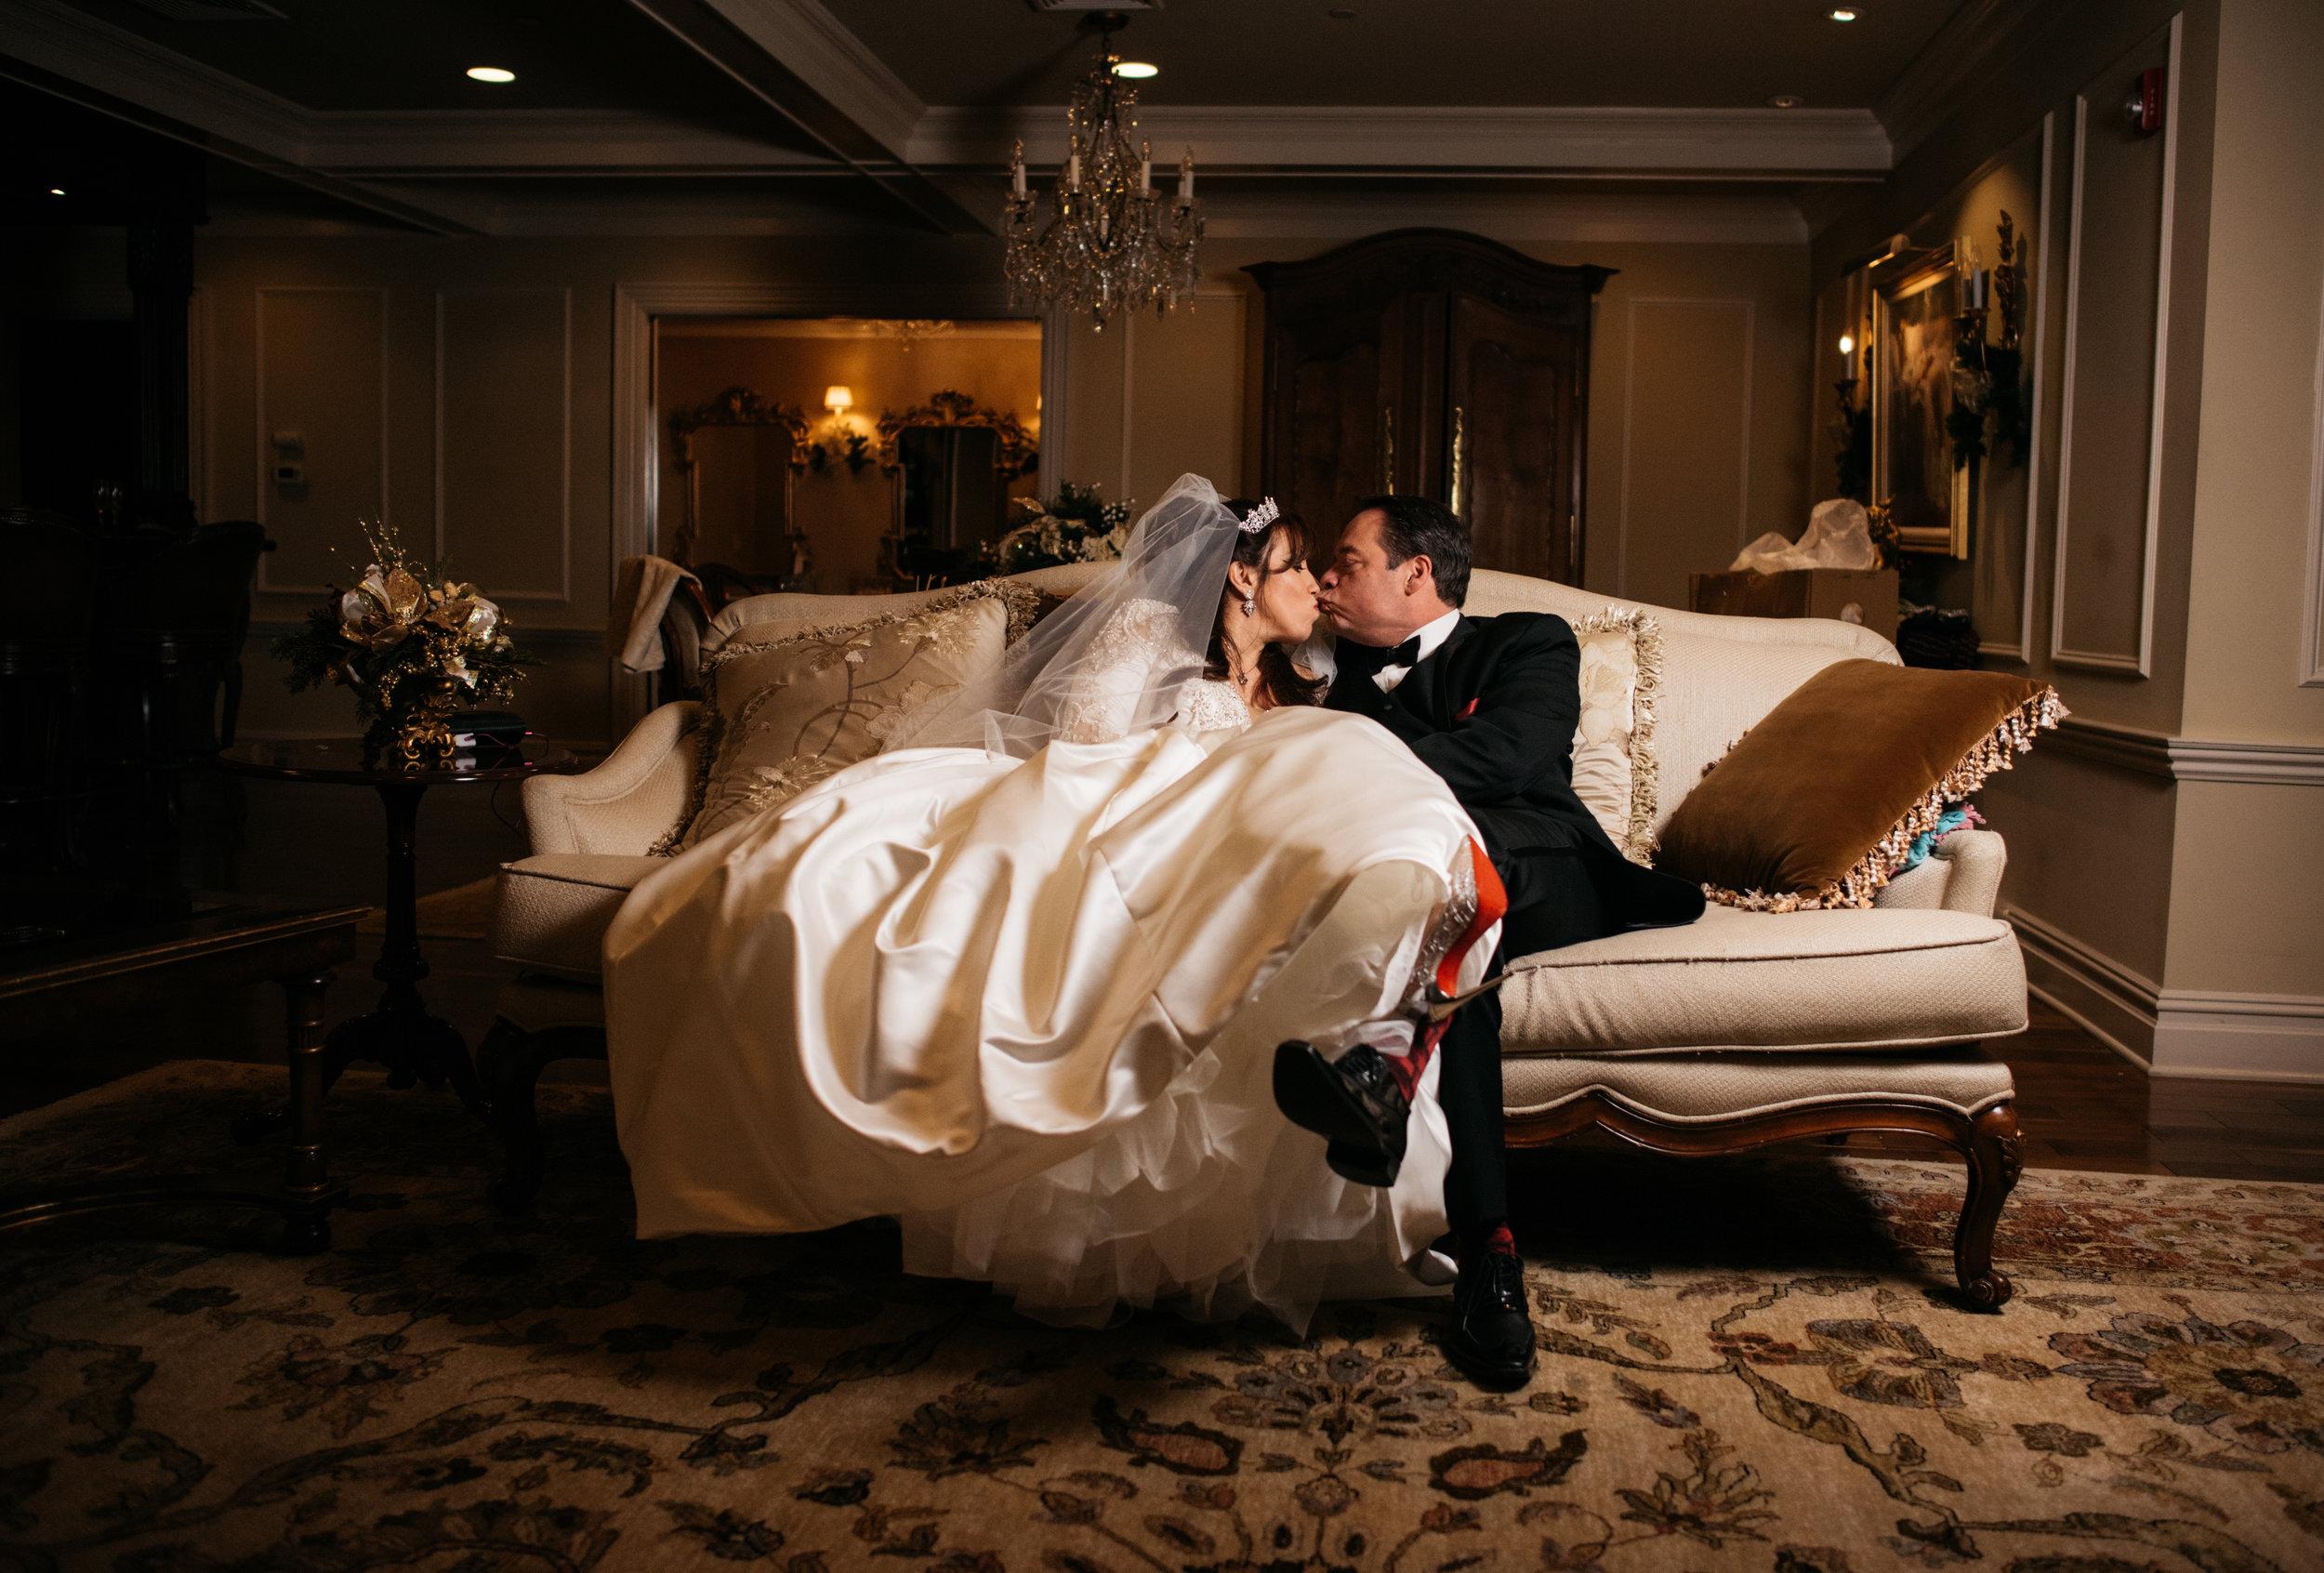 WeddingPhotos | NJPhotographer | Highlights-8-34.jpg